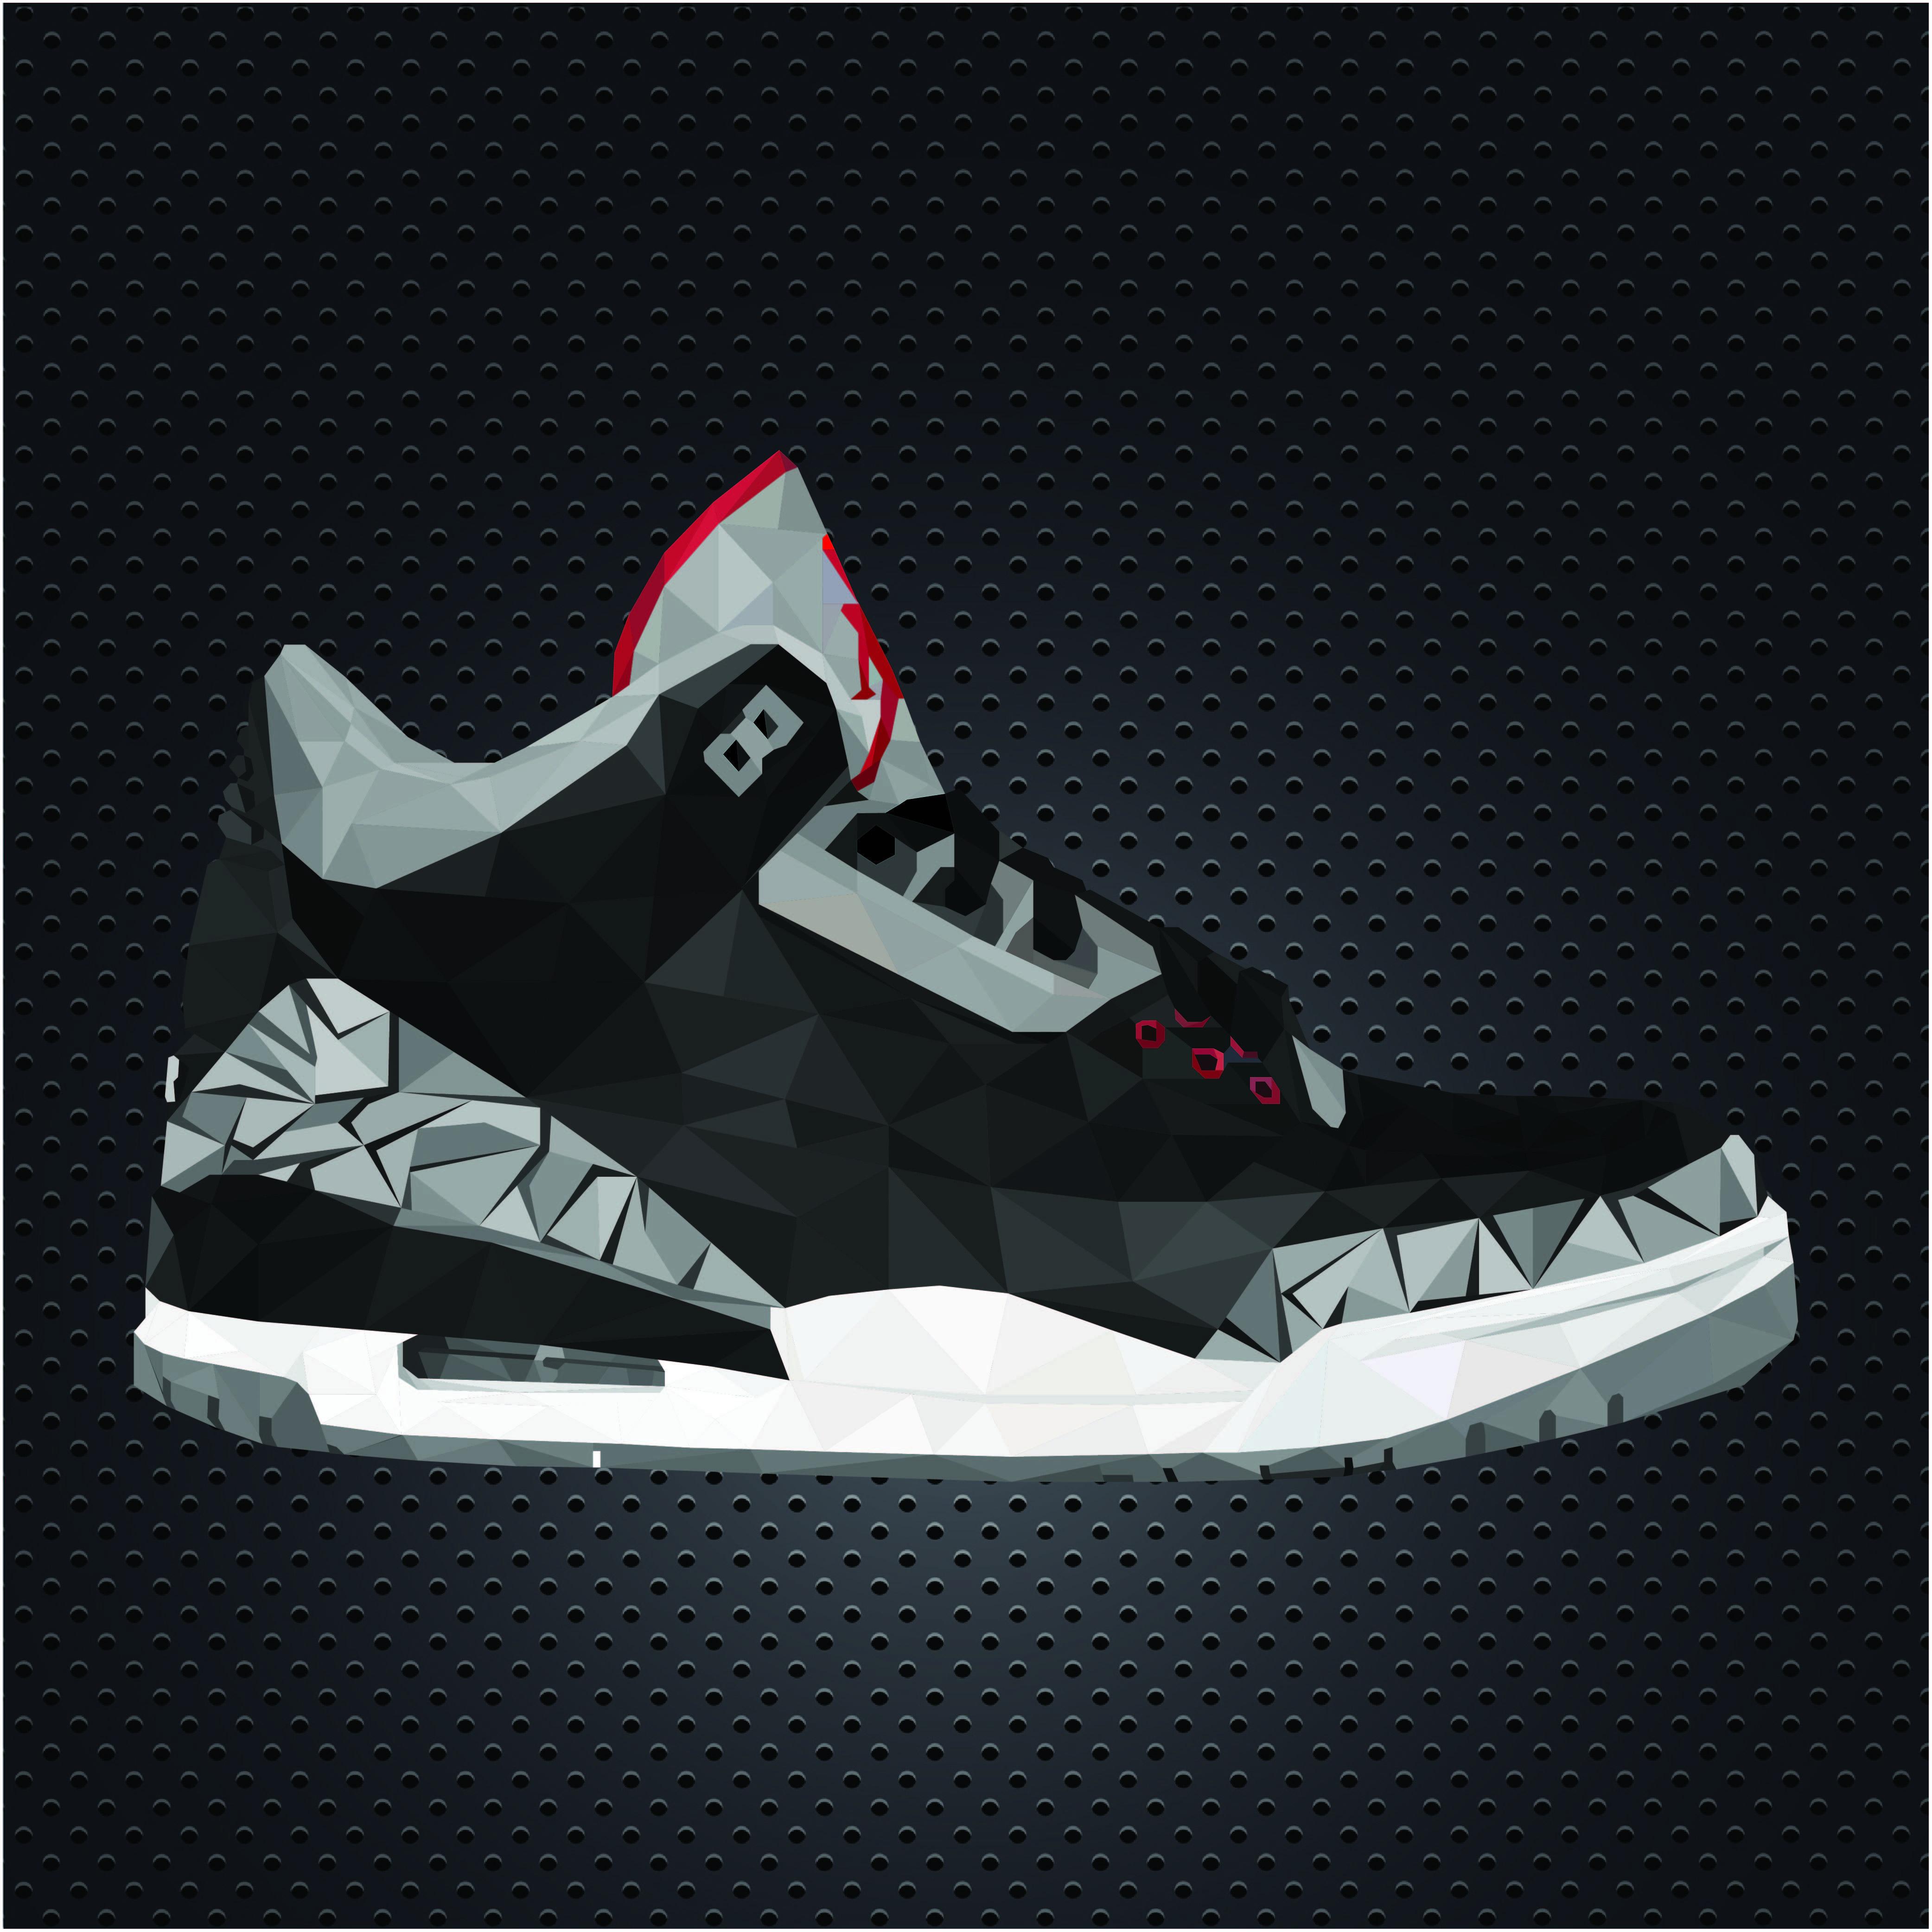 GCSE Art project: Nike Air Jordan 3 illustration